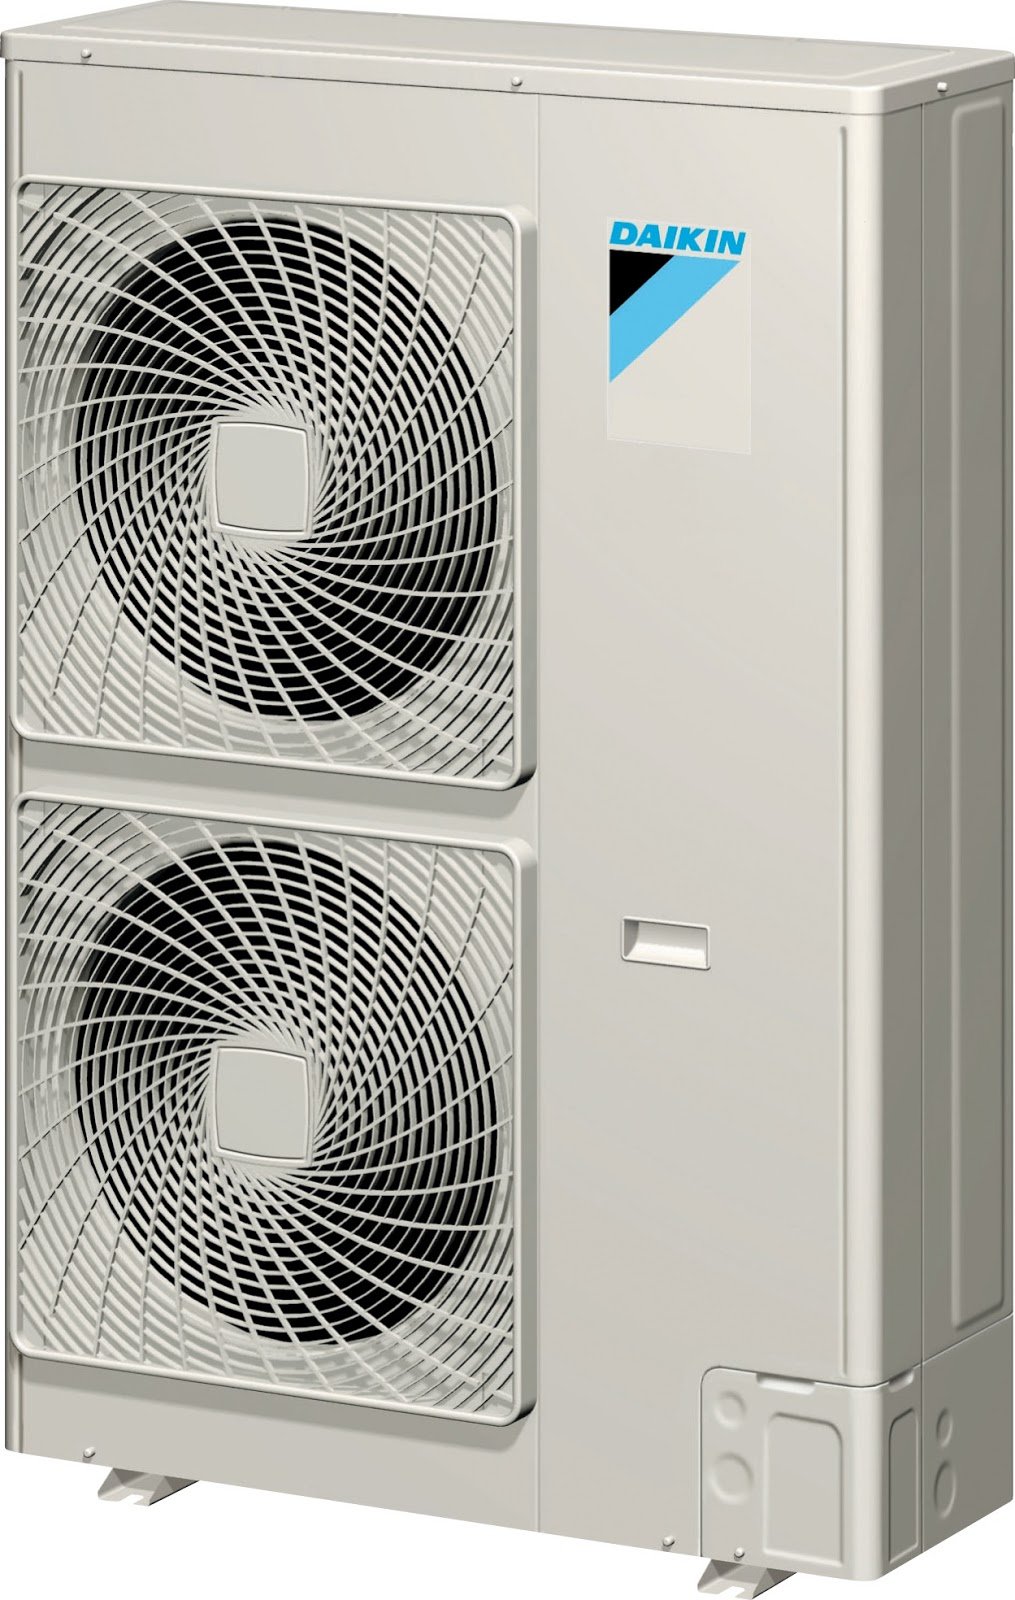 phoenix air conditioning units international growth of phoenix daikin air conditioning. Black Bedroom Furniture Sets. Home Design Ideas